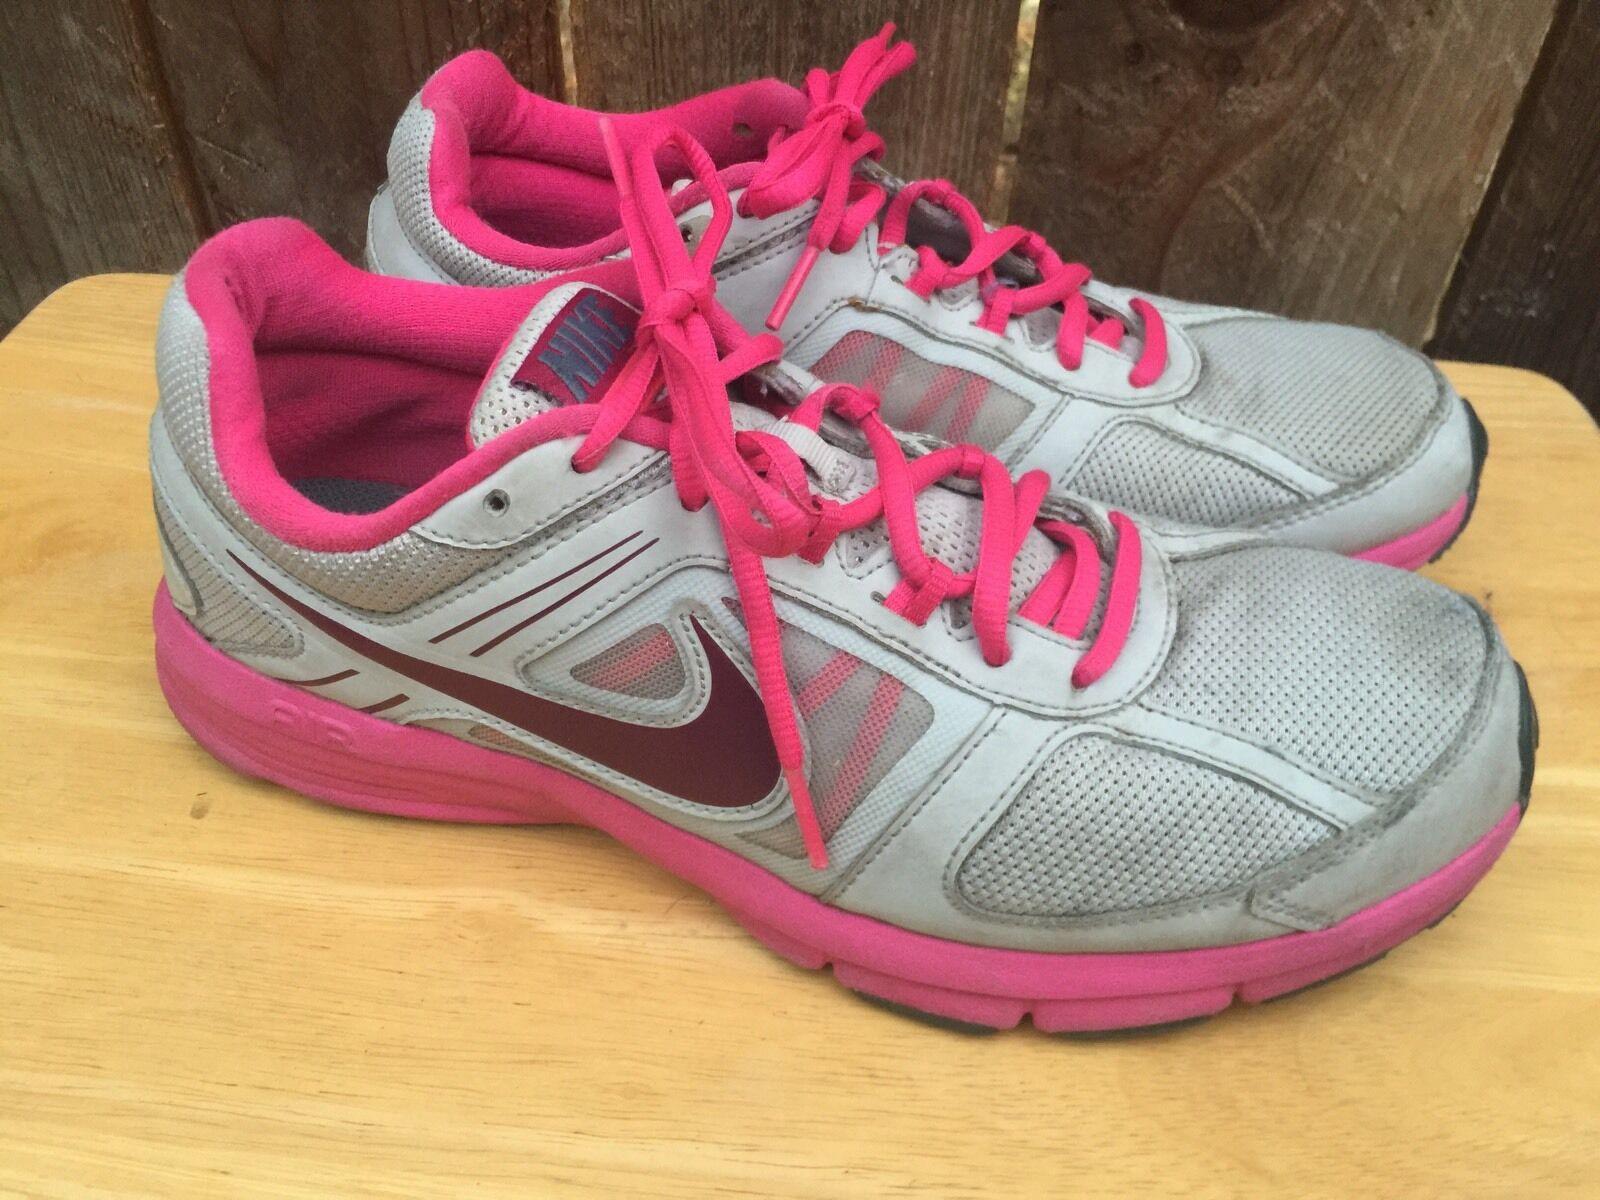 NIKE AIR Relentless 3 Womens Gray Pink Running Sneakers Shoes Sz 9.5